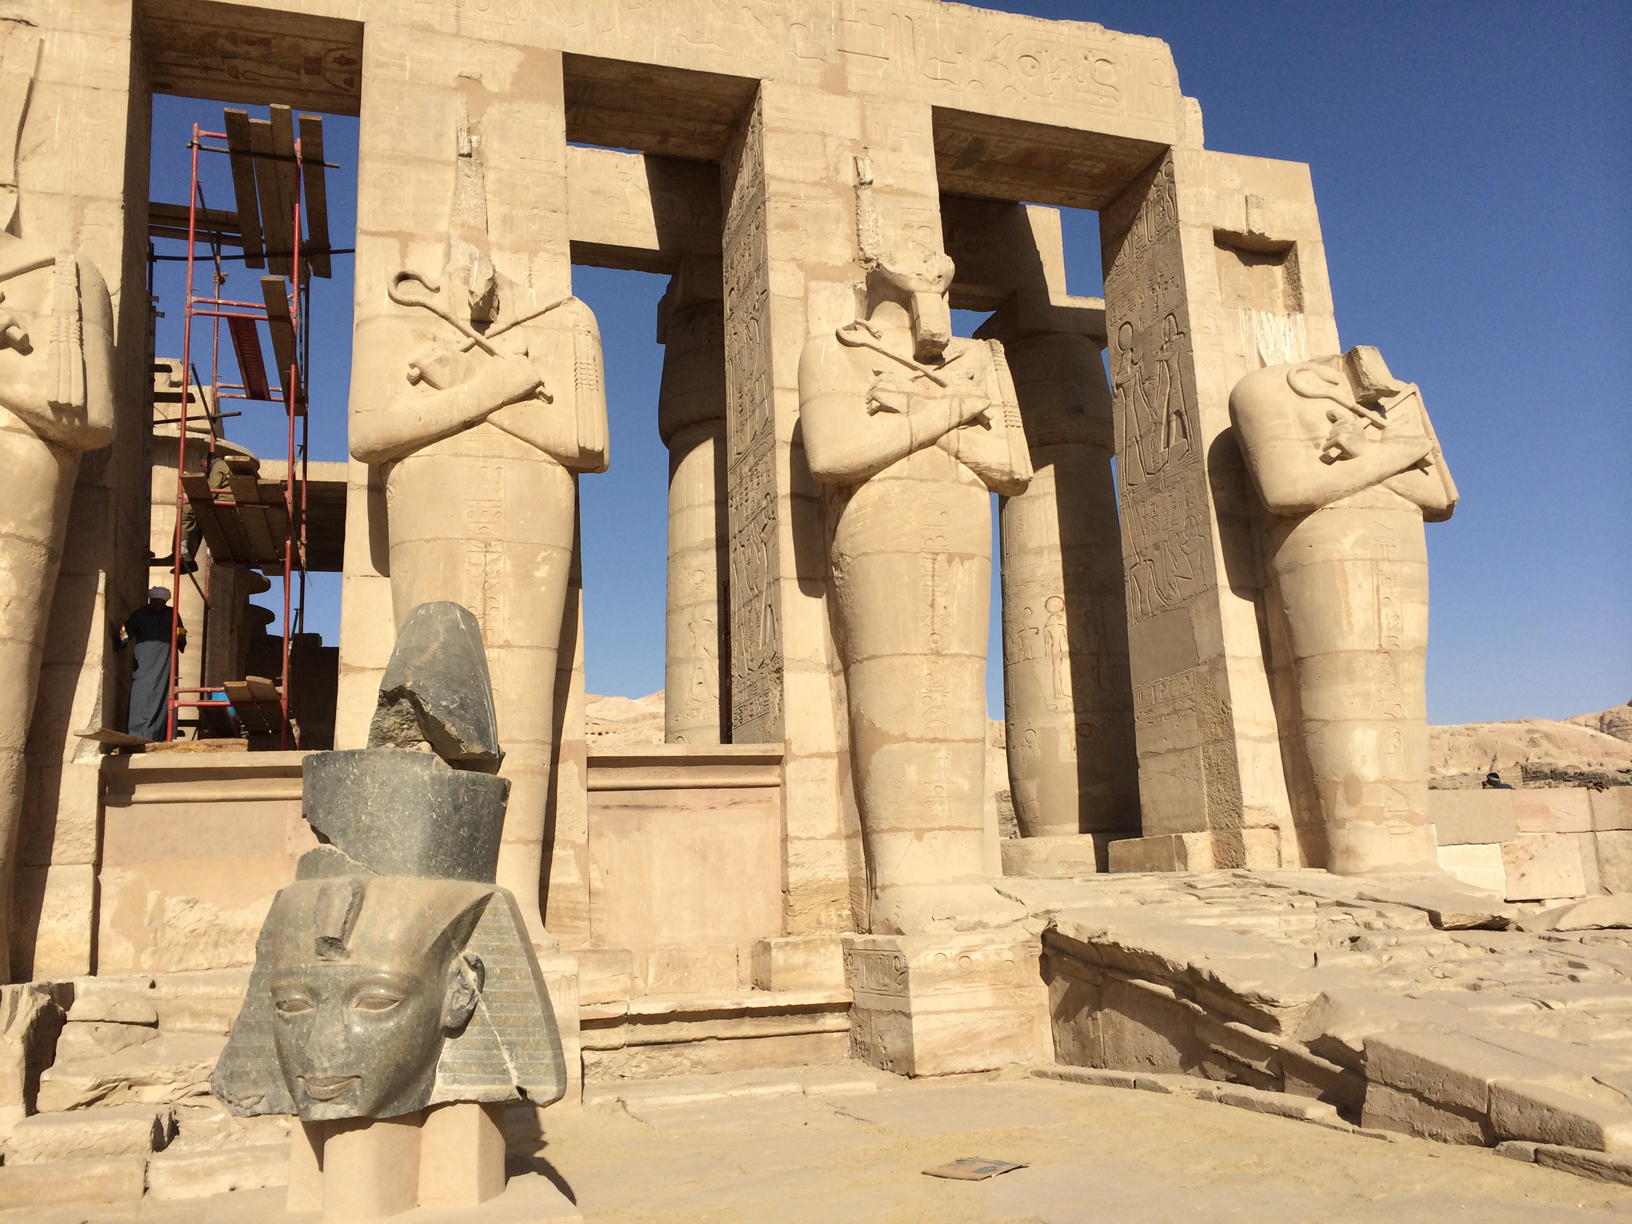 Sphinxes avenue in Luxor temple premises.